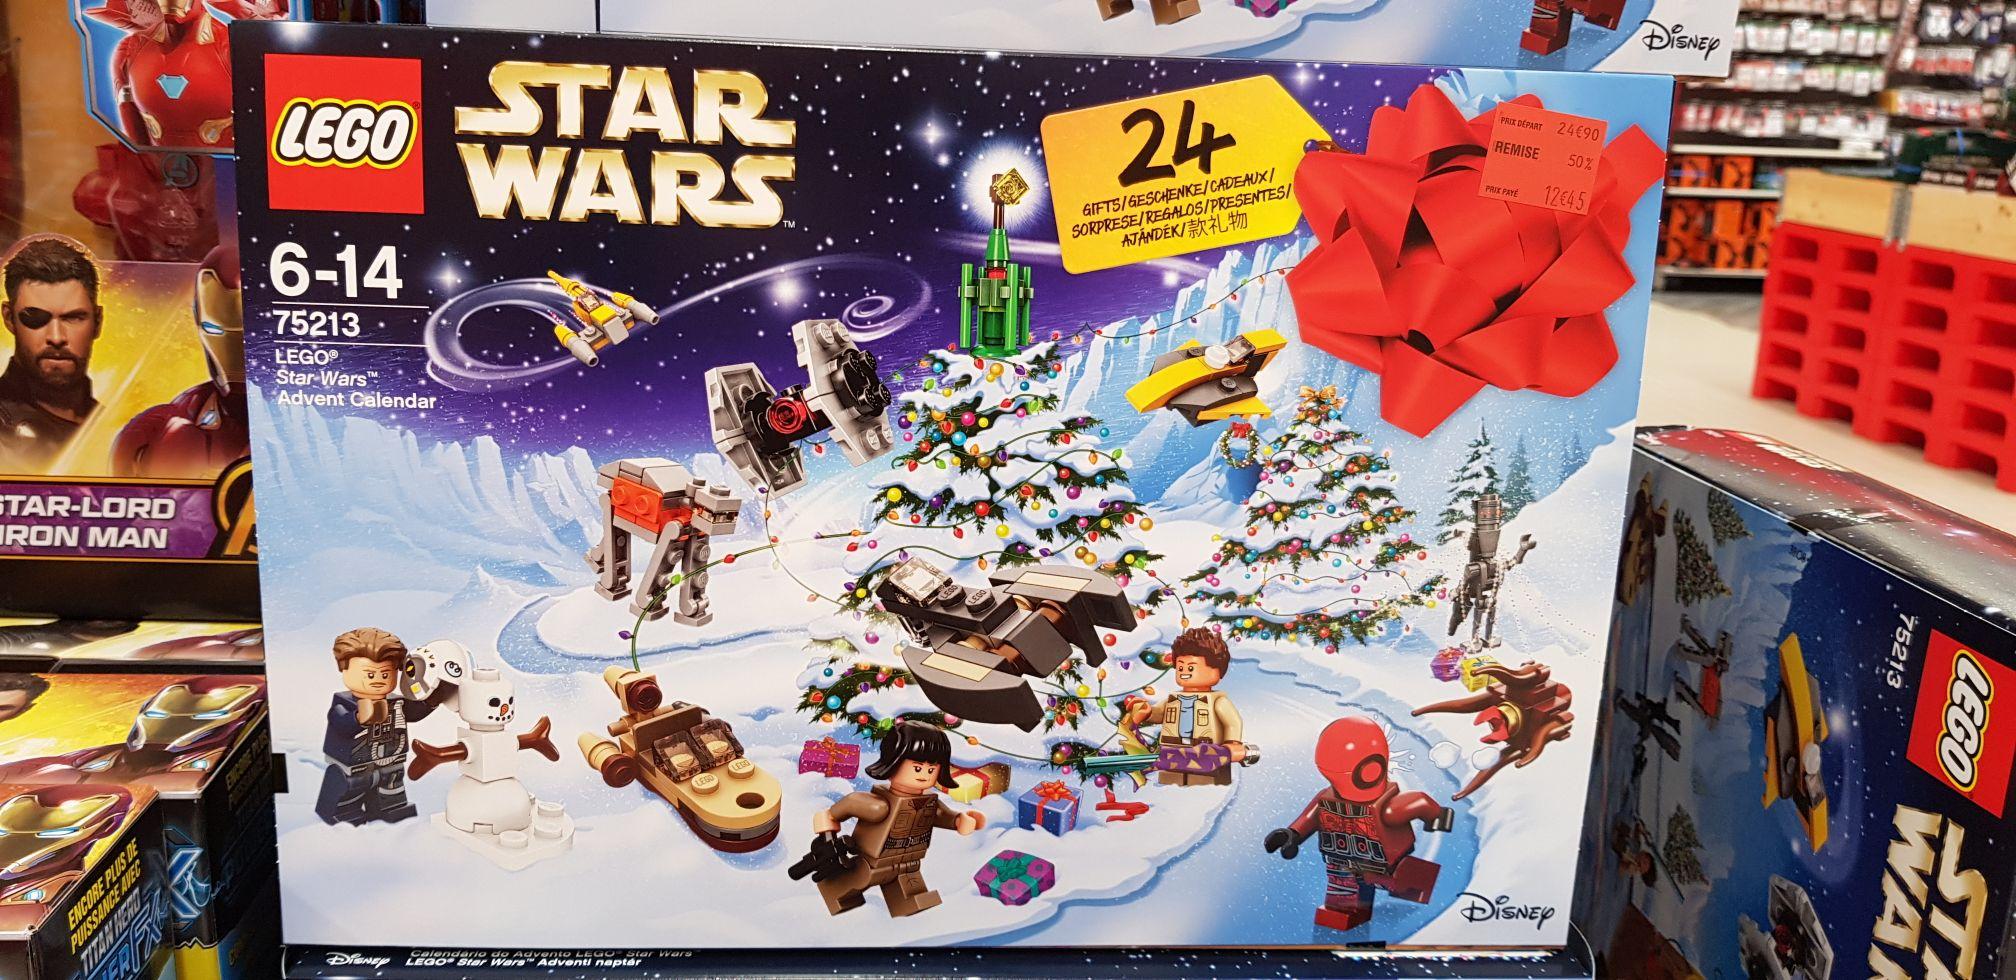 Calendrier De L Avent Lego Star Wars Carrefour.Calendrier De L Avent Lego Star Wars 75213 Beaujoire 44